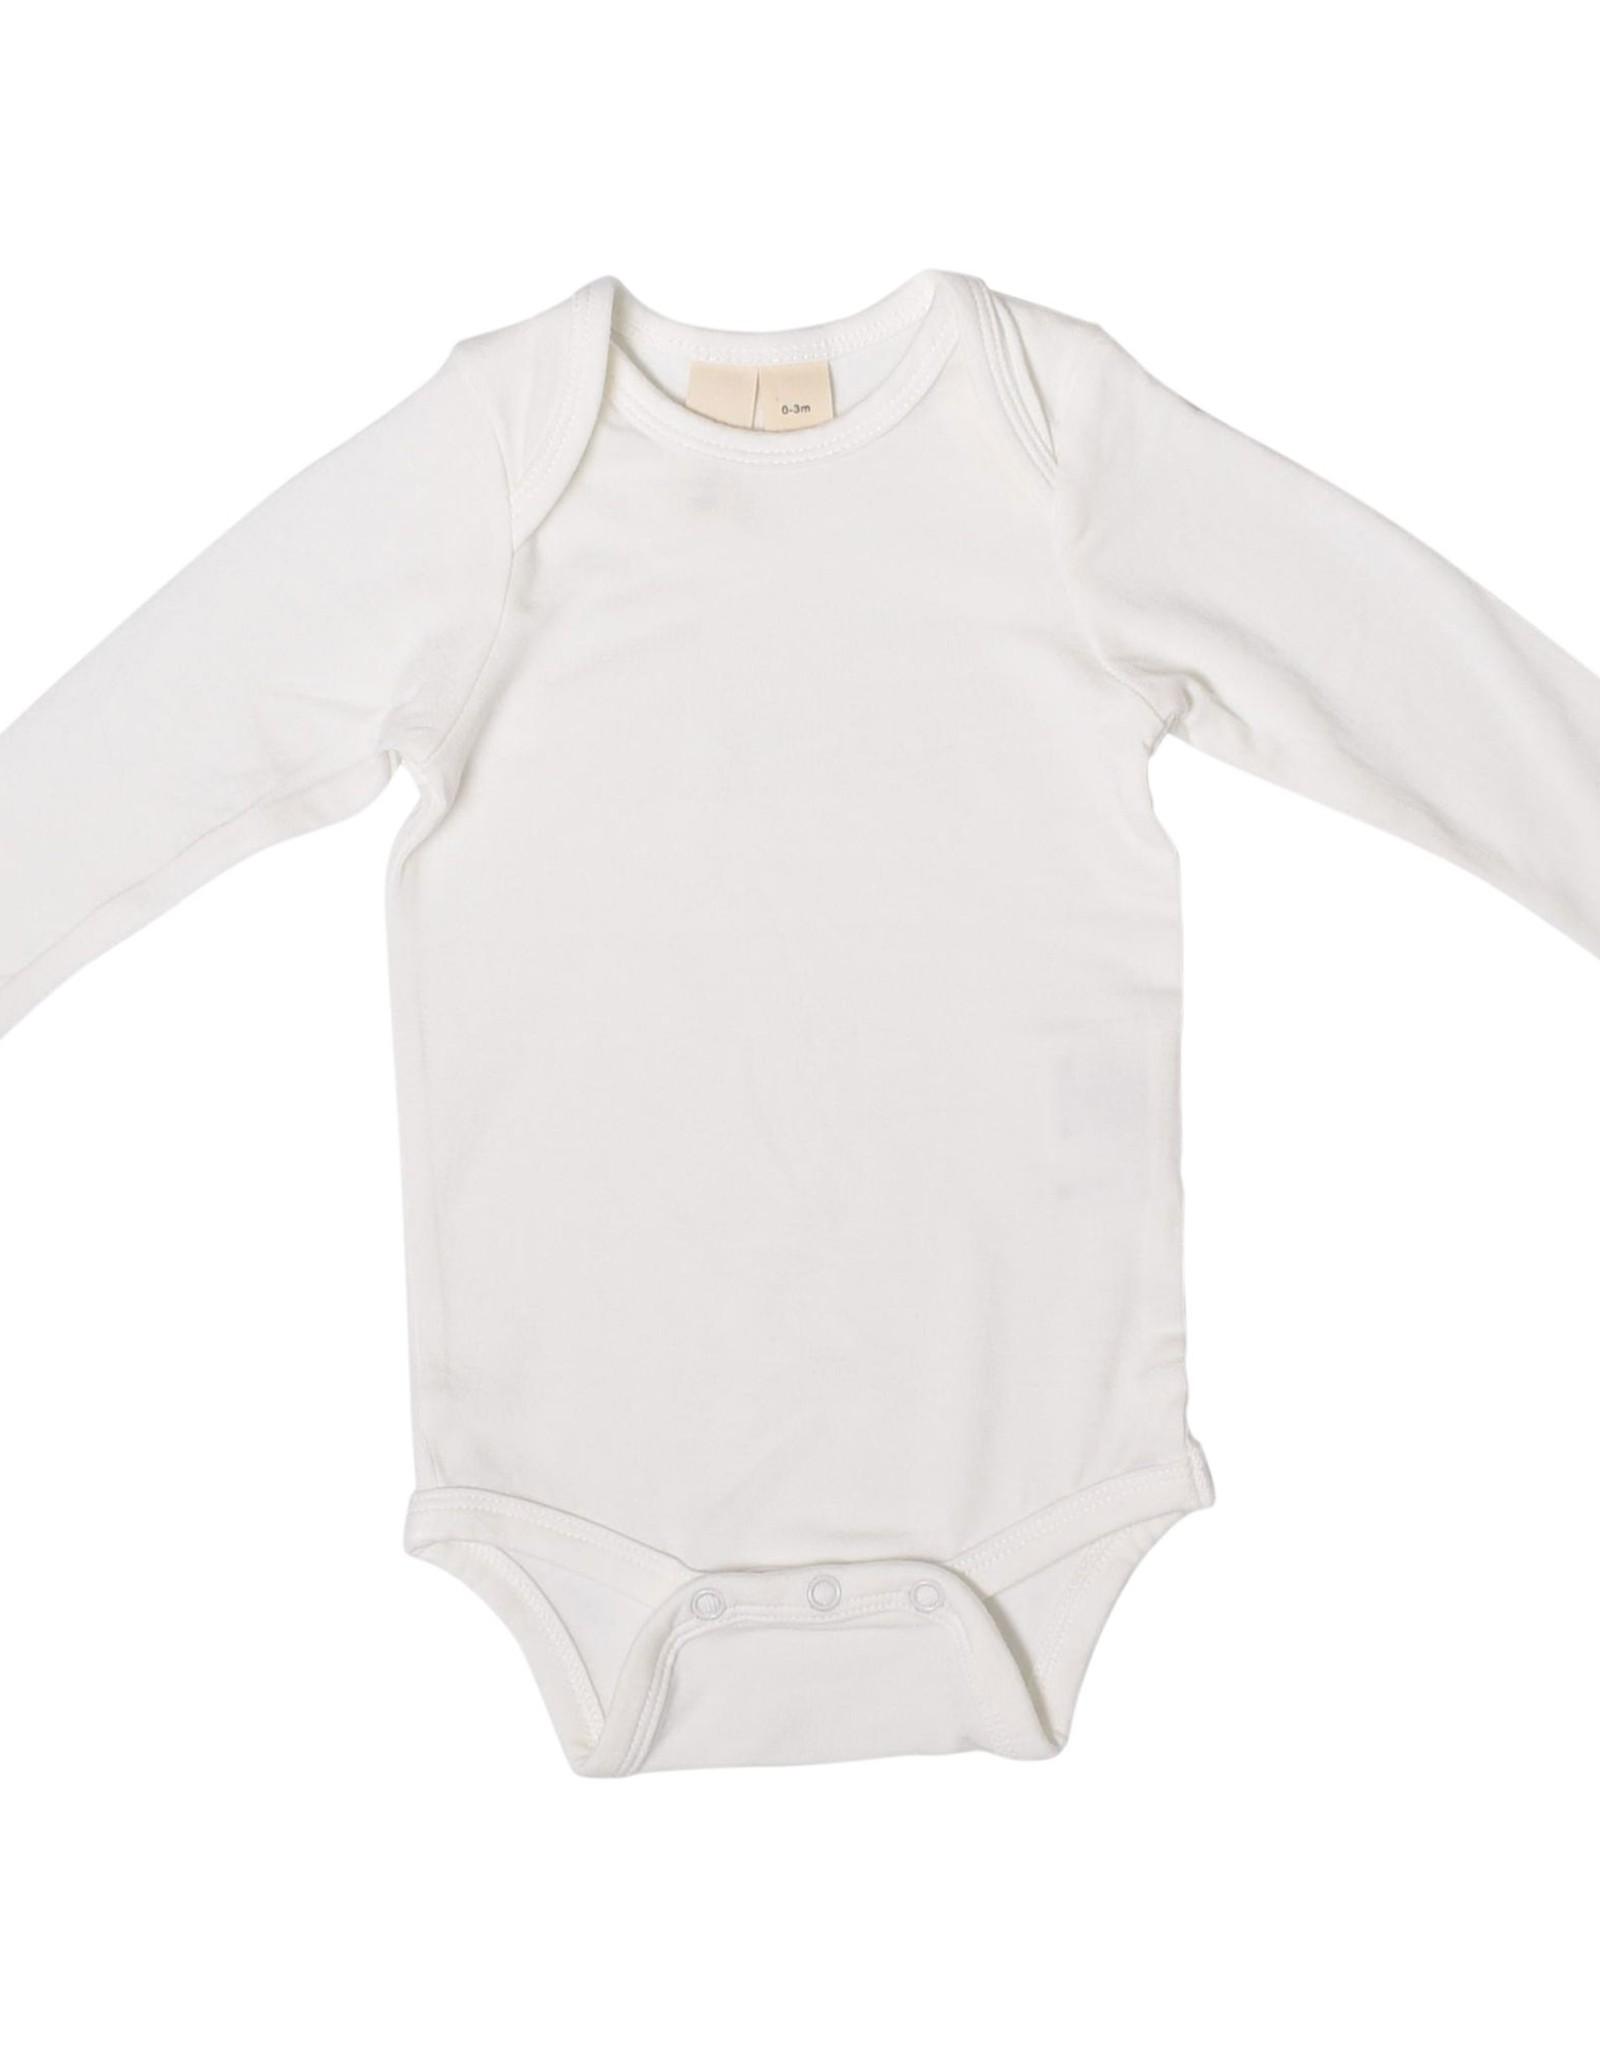 Kyte Baby l/s bodysuit - cloud